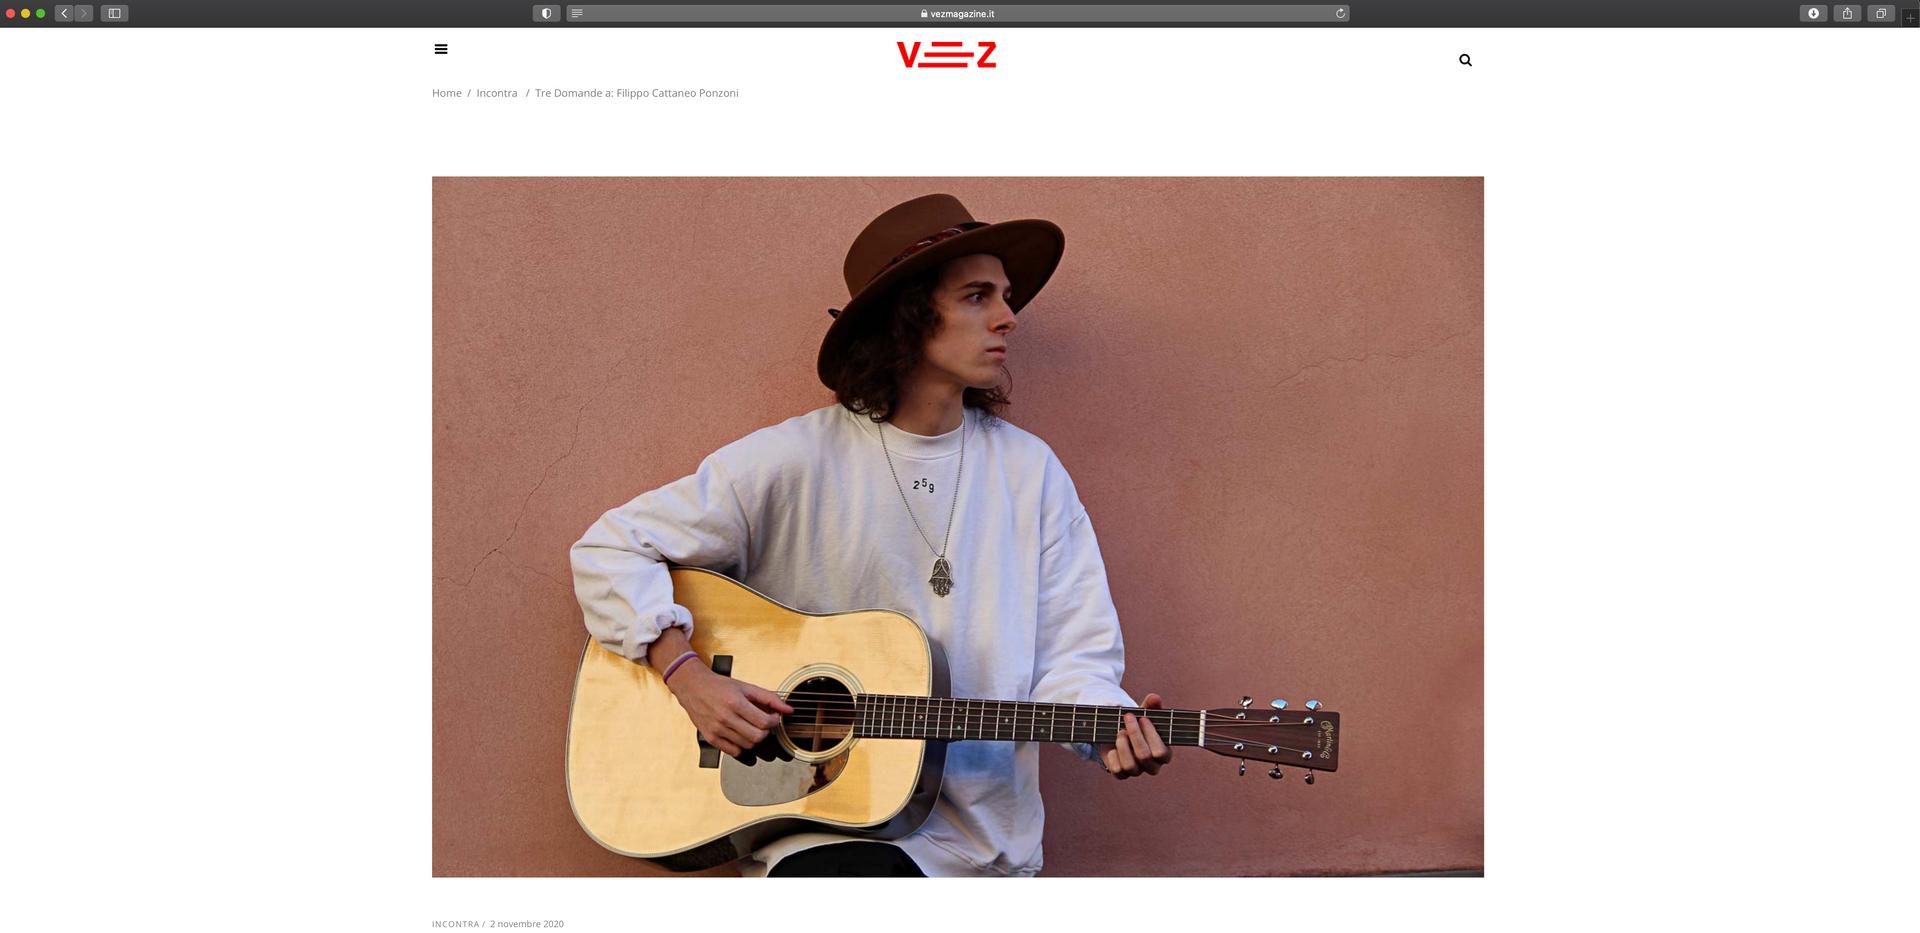 Articolo VEZ.png